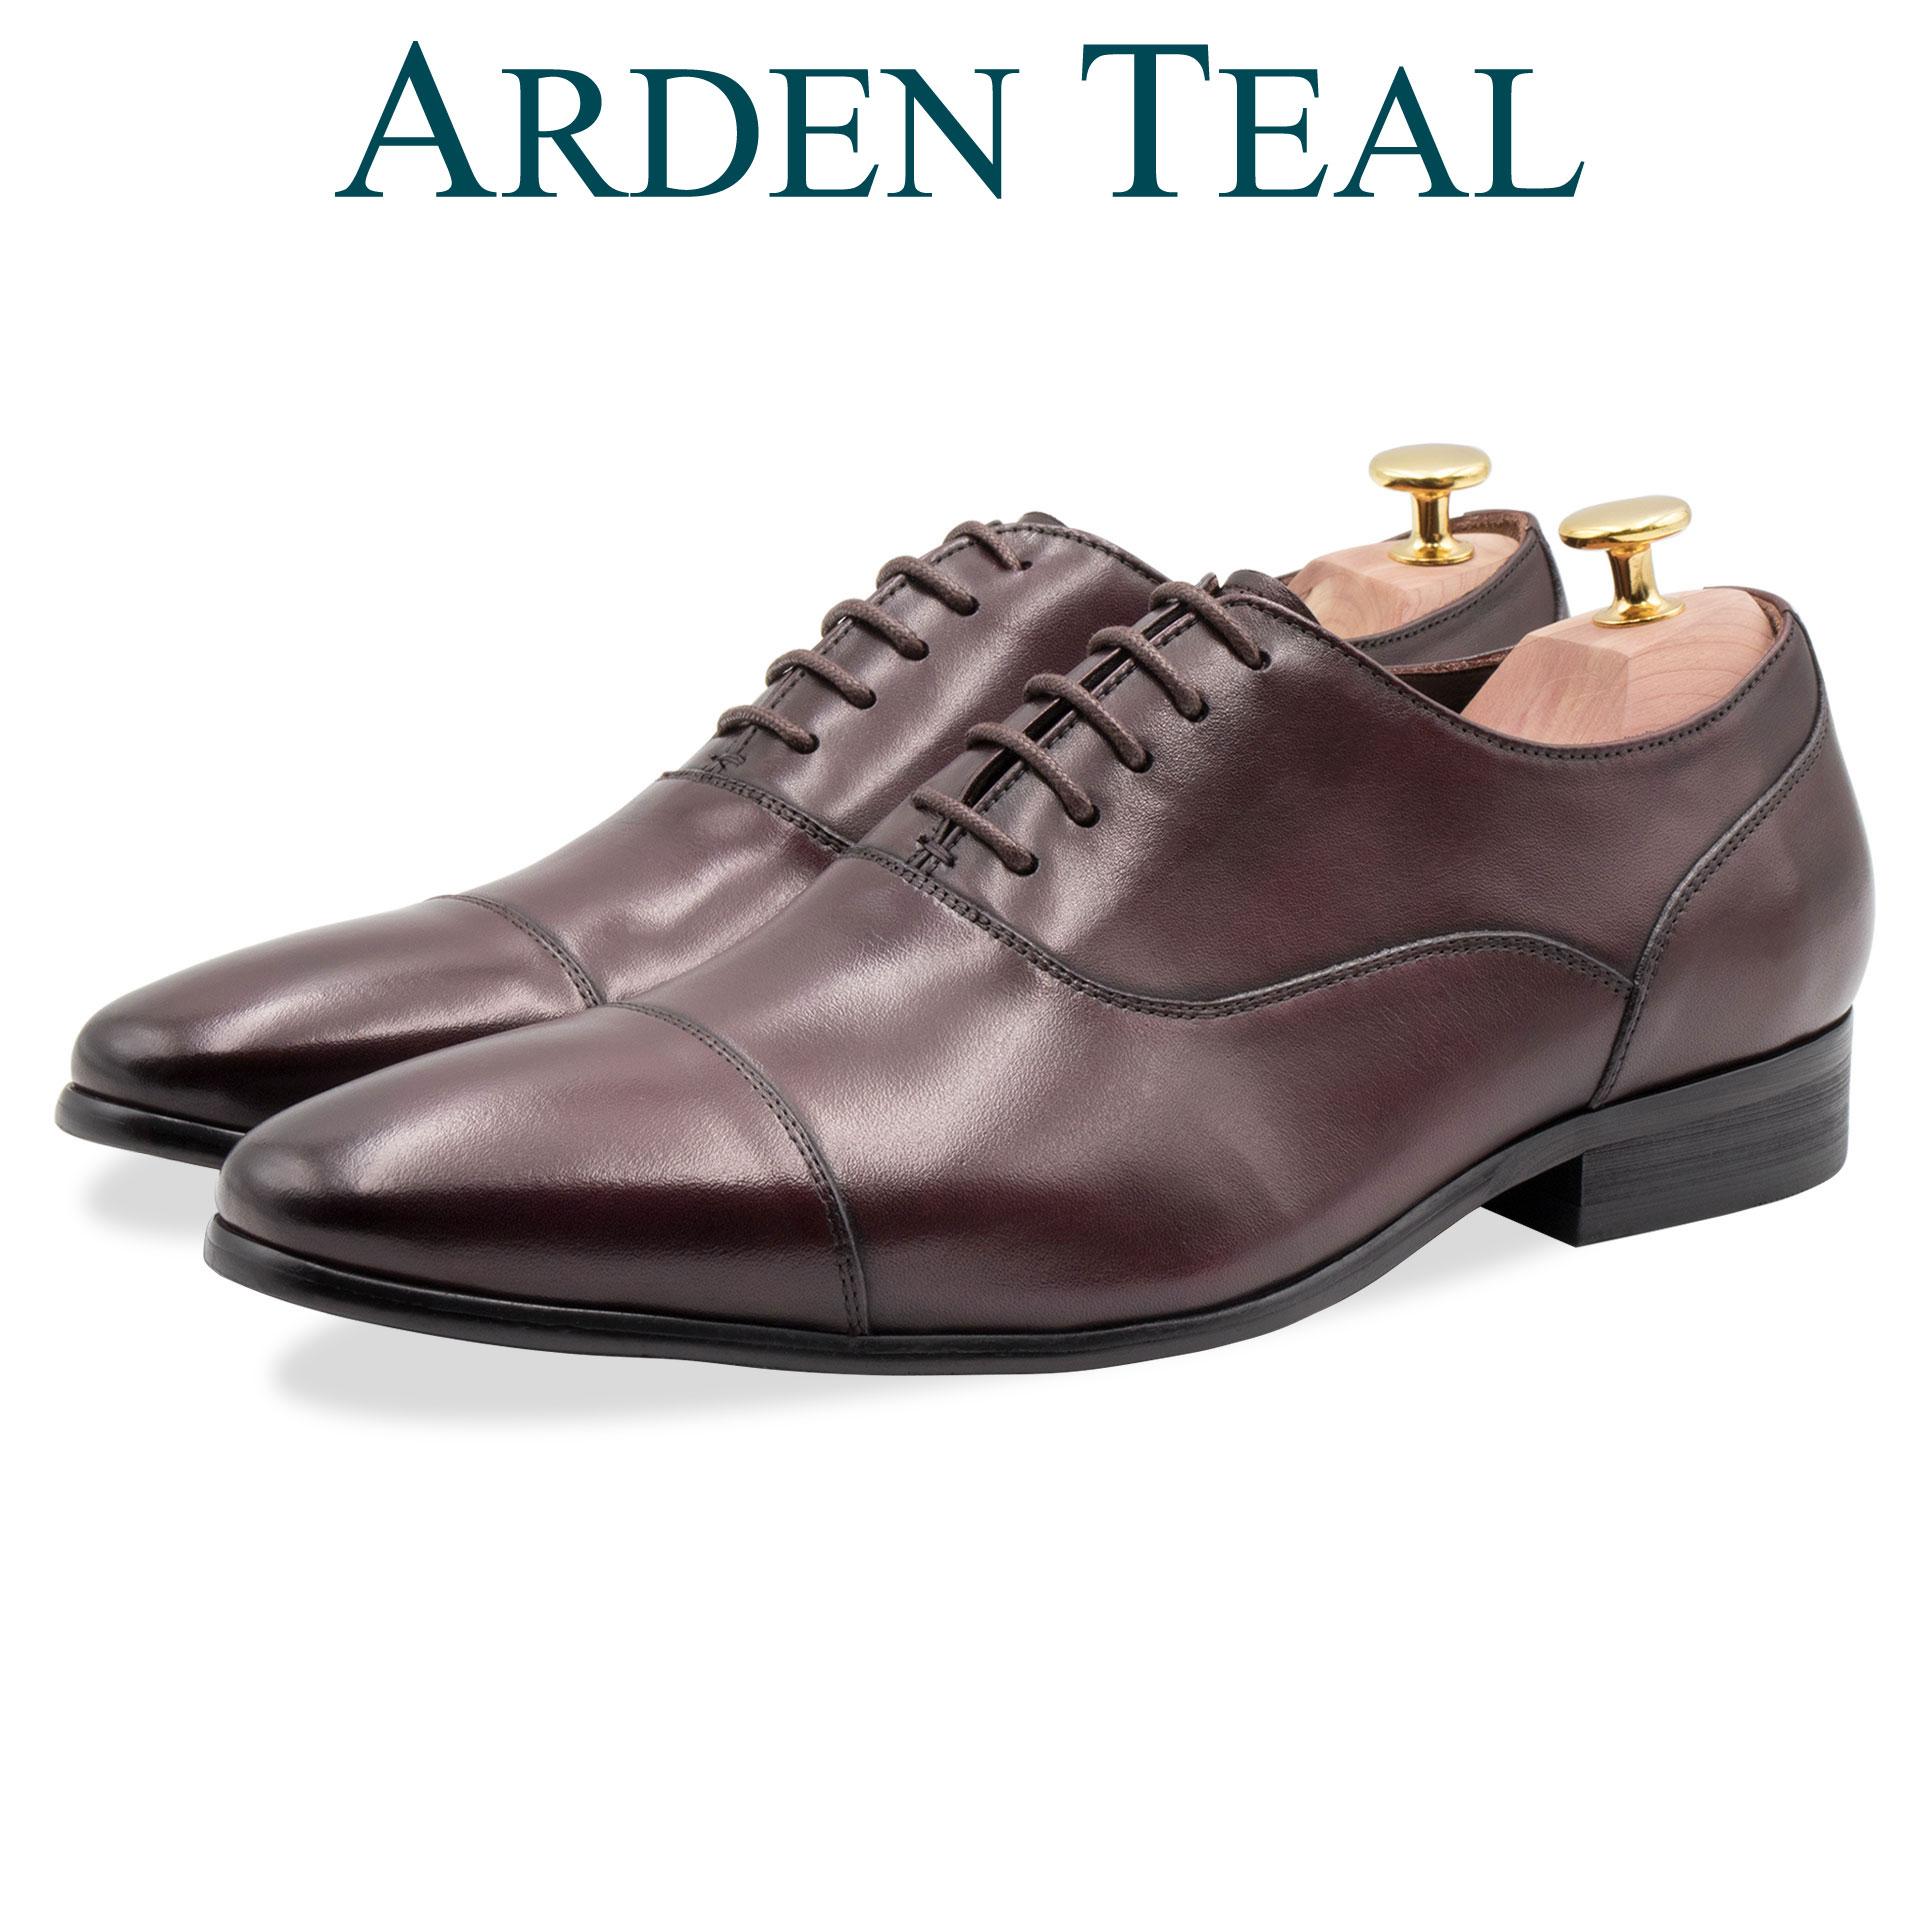 Arden Teal - Calafate Straight Cap